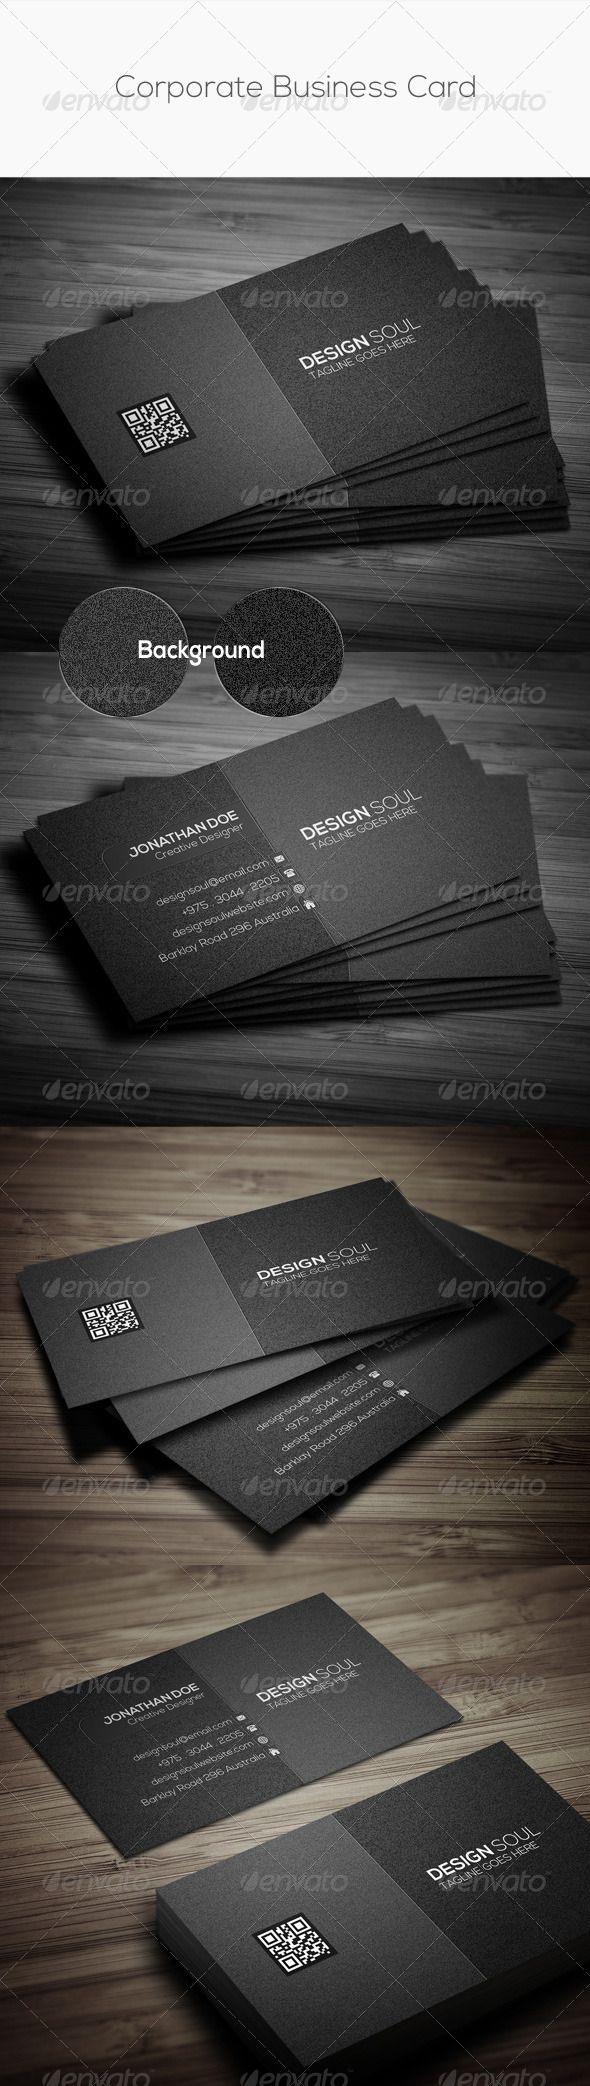 96 best Business Card - S E L E C T I O N images on Pinterest ...